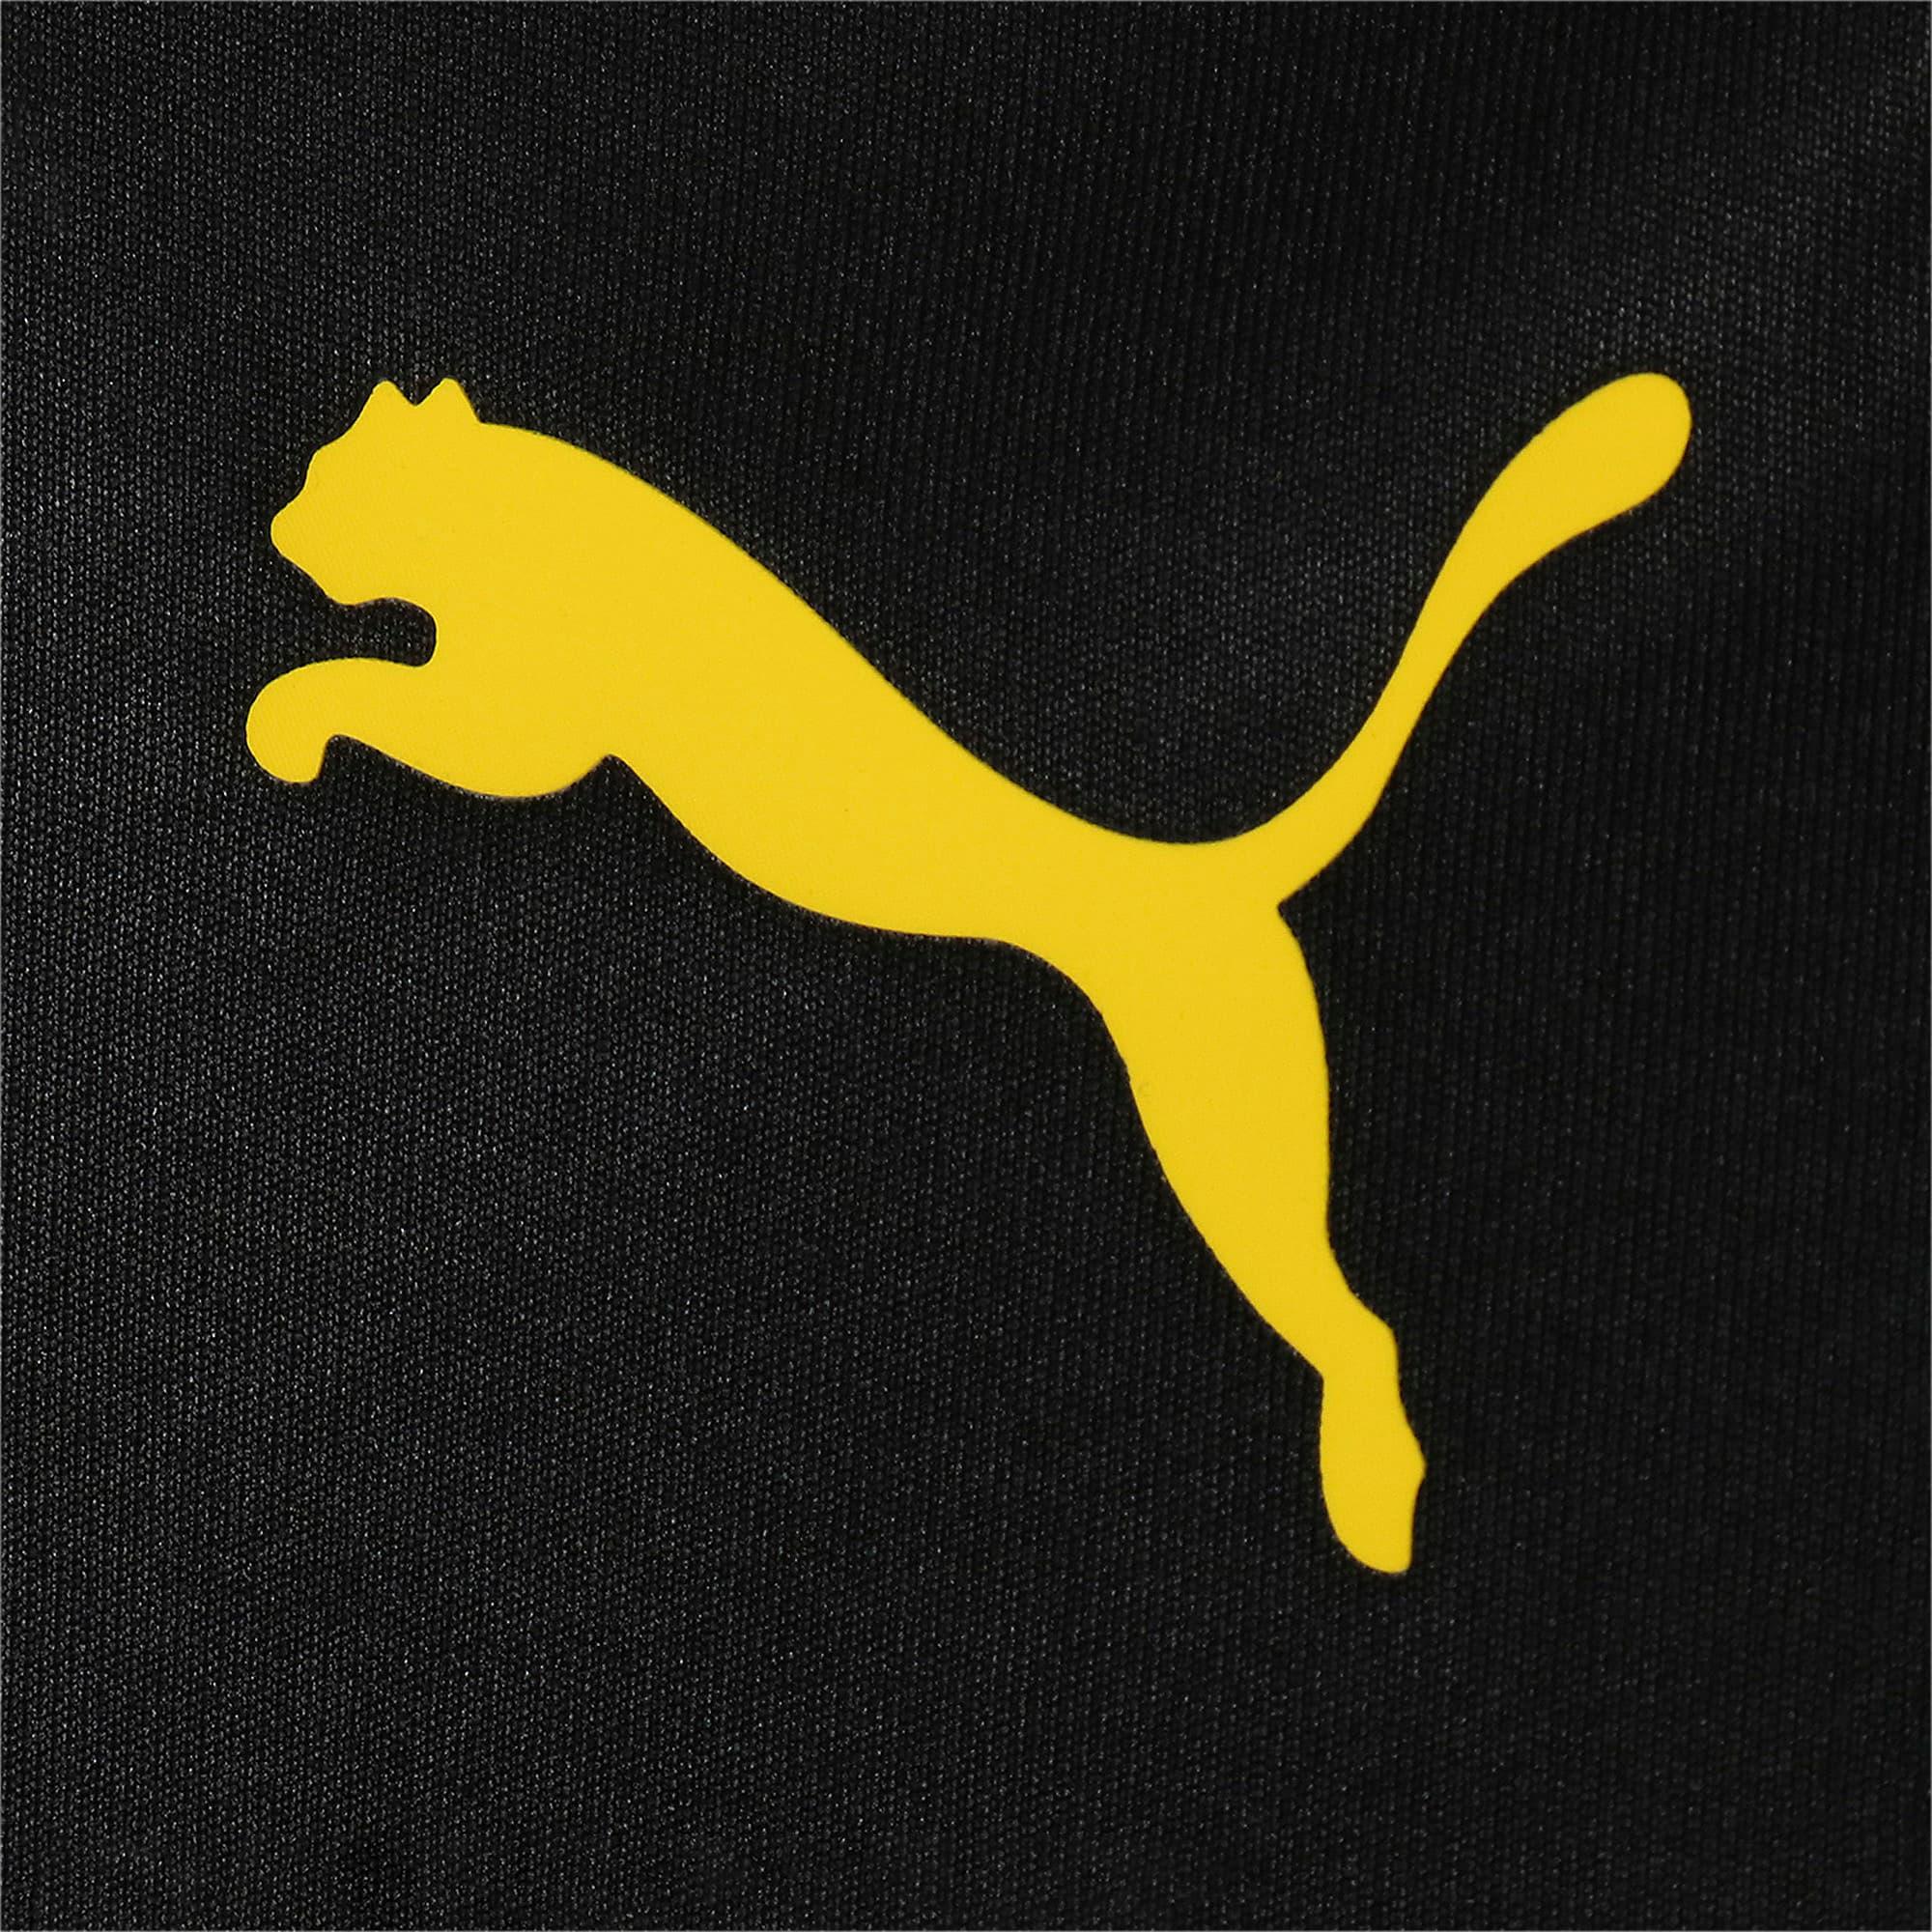 Thumbnail 7 of ドルトムント BVB SS トレーニング ジャージ 半袖, Puma Black-Cyber Yellow, medium-JPN